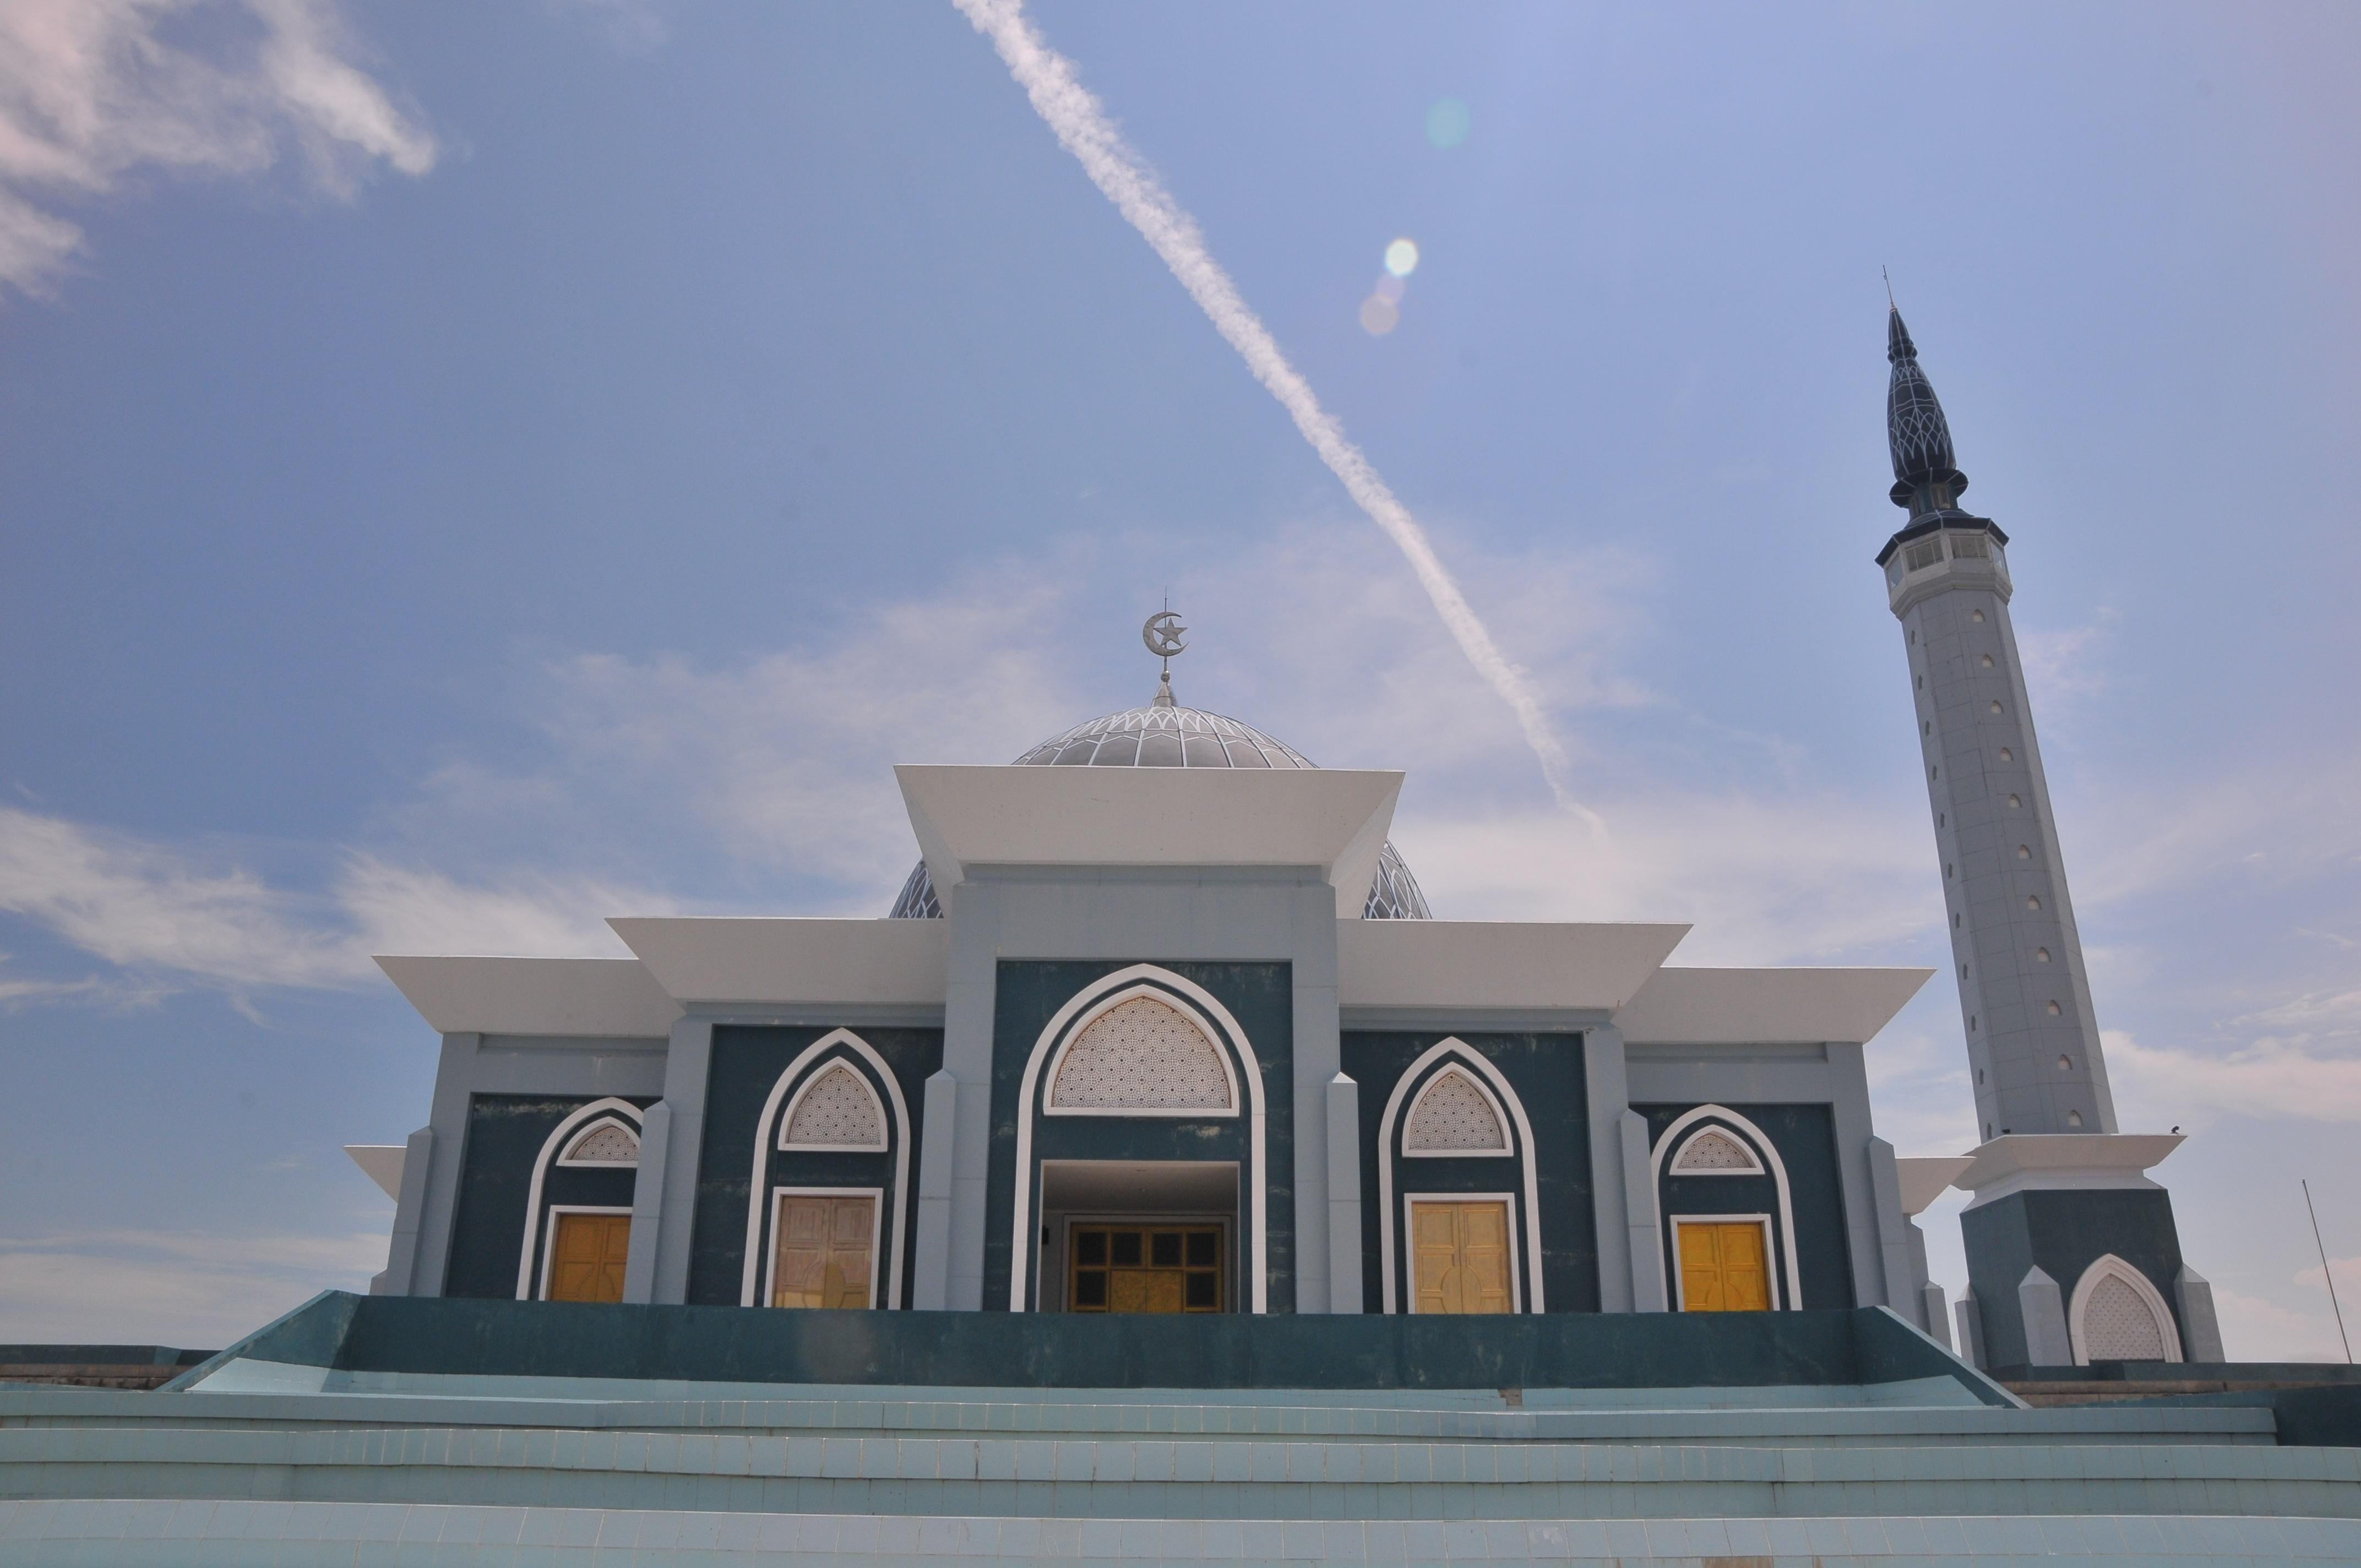 Pulau Dompak Pusat Pemerintahan Provinsi Kepulauan Riau Robbi Hafzan Masjid